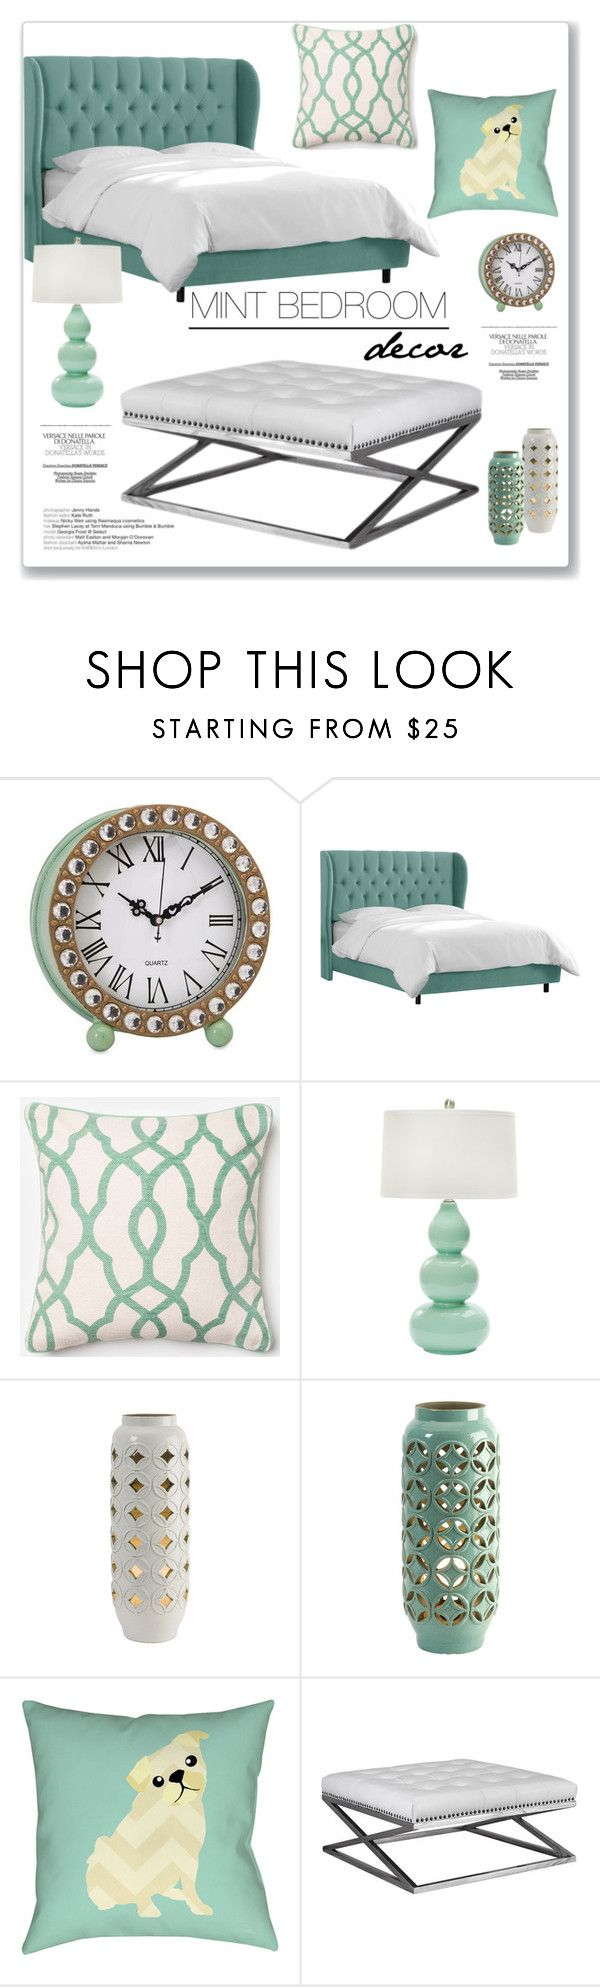 Best 25+ Bedroom mint ideas on Pinterest | Mint bedroom walls ...